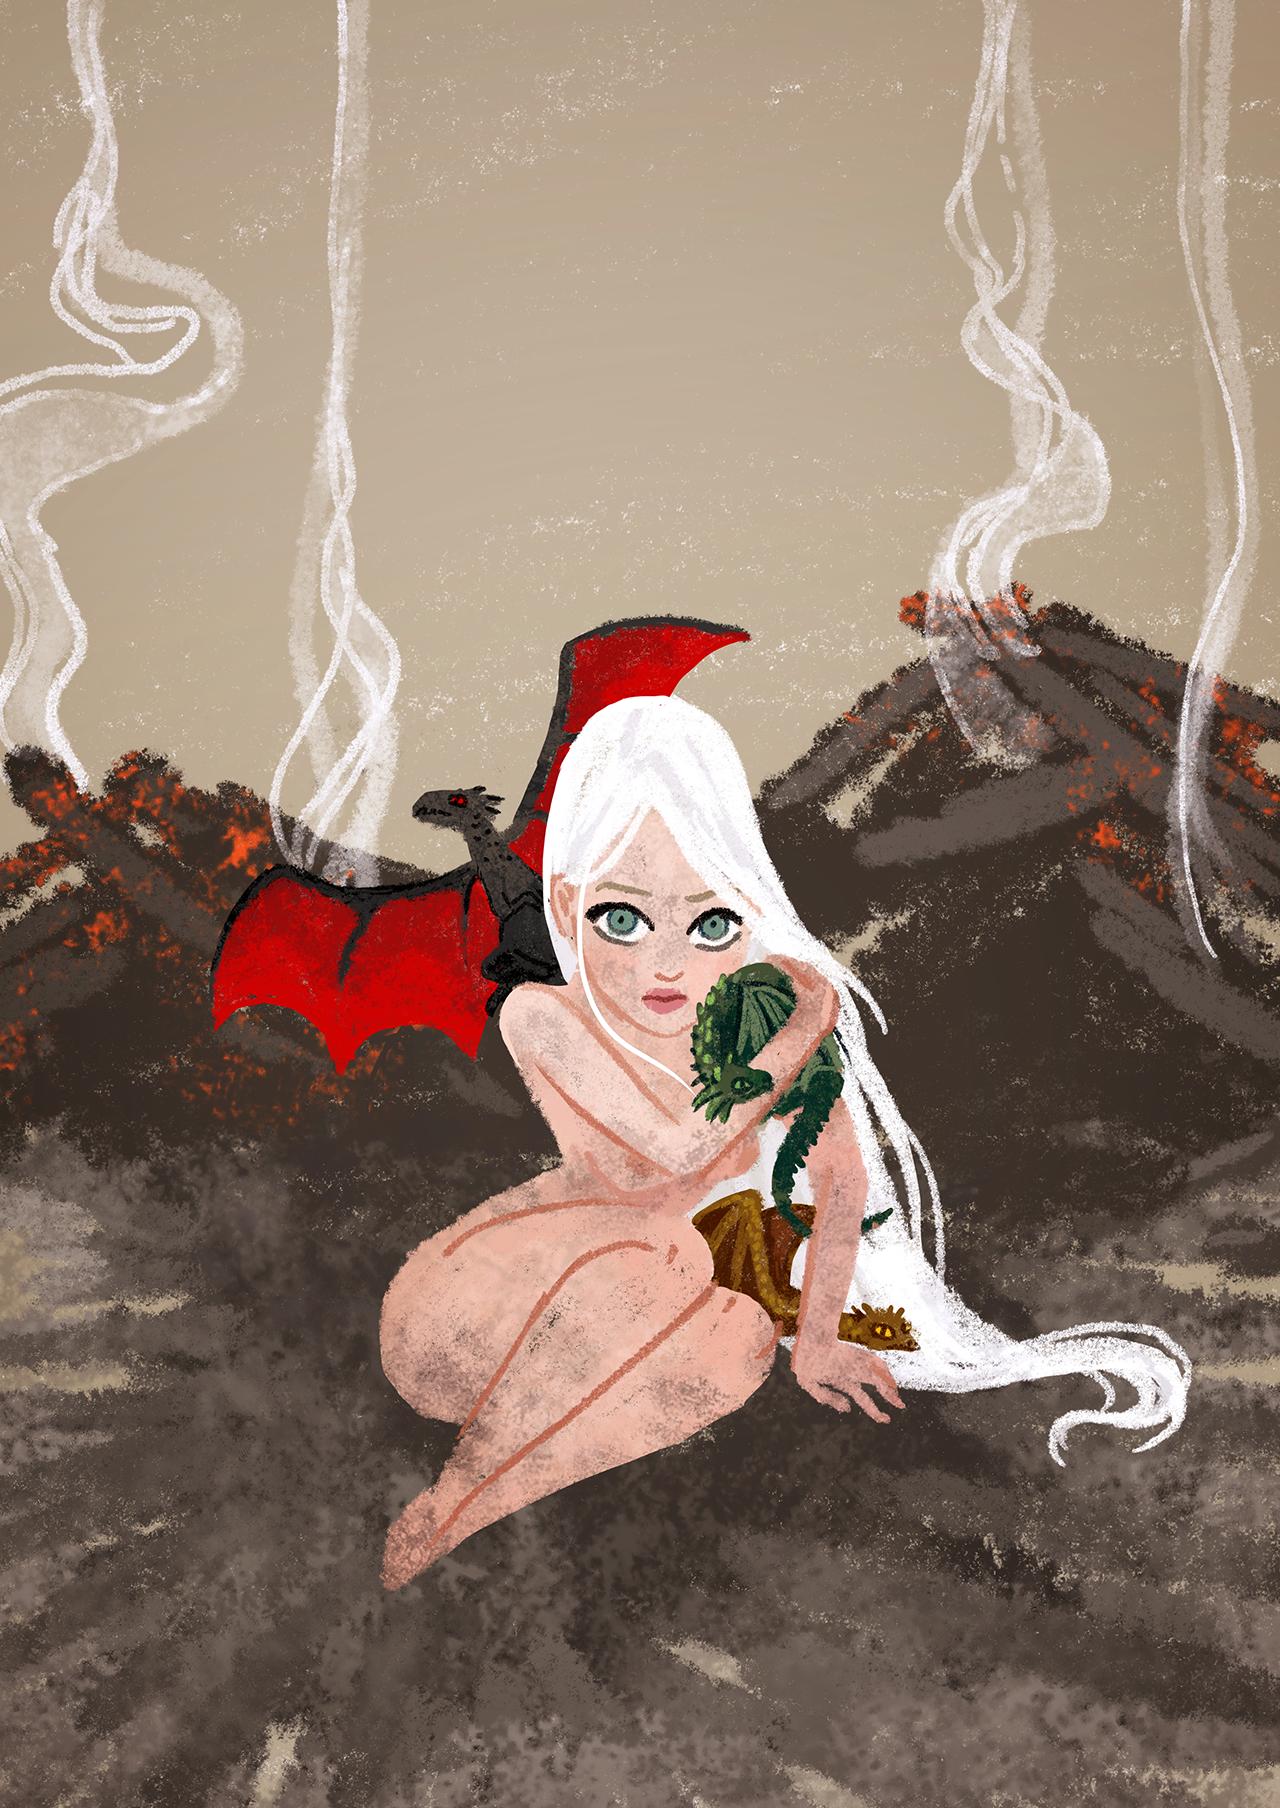 Обои background, tv series, daenerys targaryen, vintage, Game of thrones, minimalism, pinup models, Pinup, dragon, fantasy. Минимализм foto 3